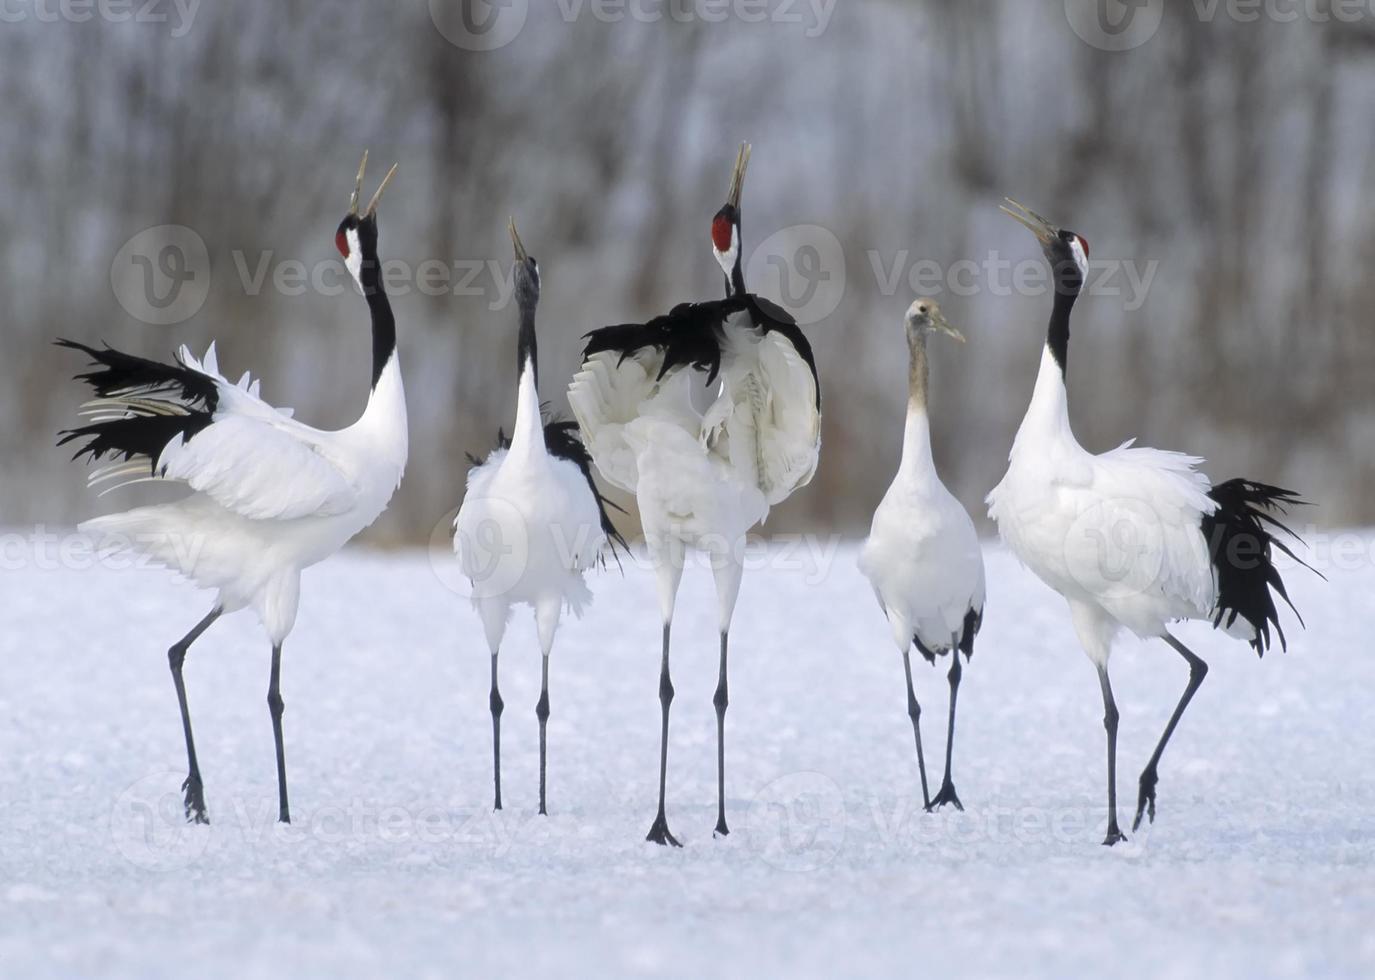 gru giapponesi che cantano nell'Hokkaido in Giappone. foto